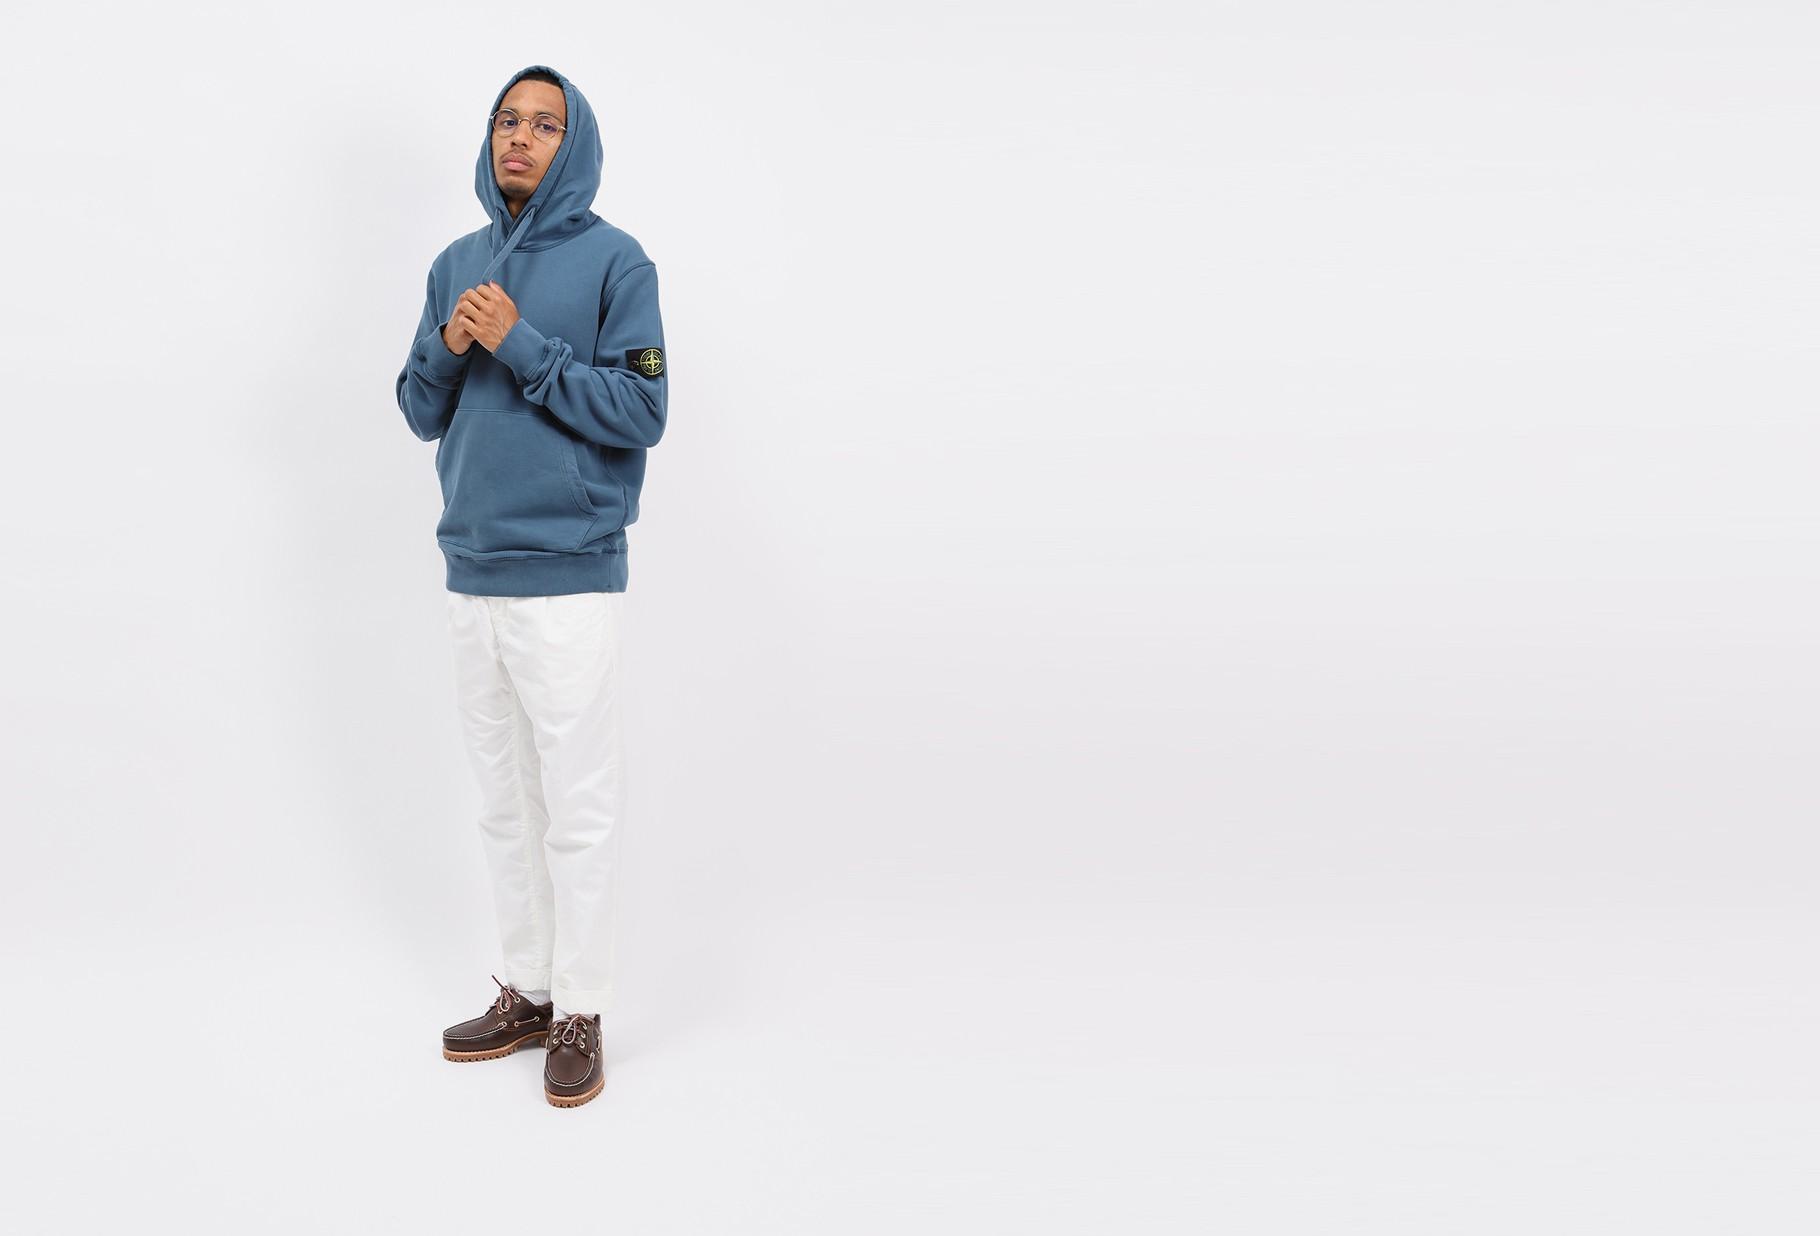 STONE ISLAND / 64120 hooded sweater v0023 Ottanio